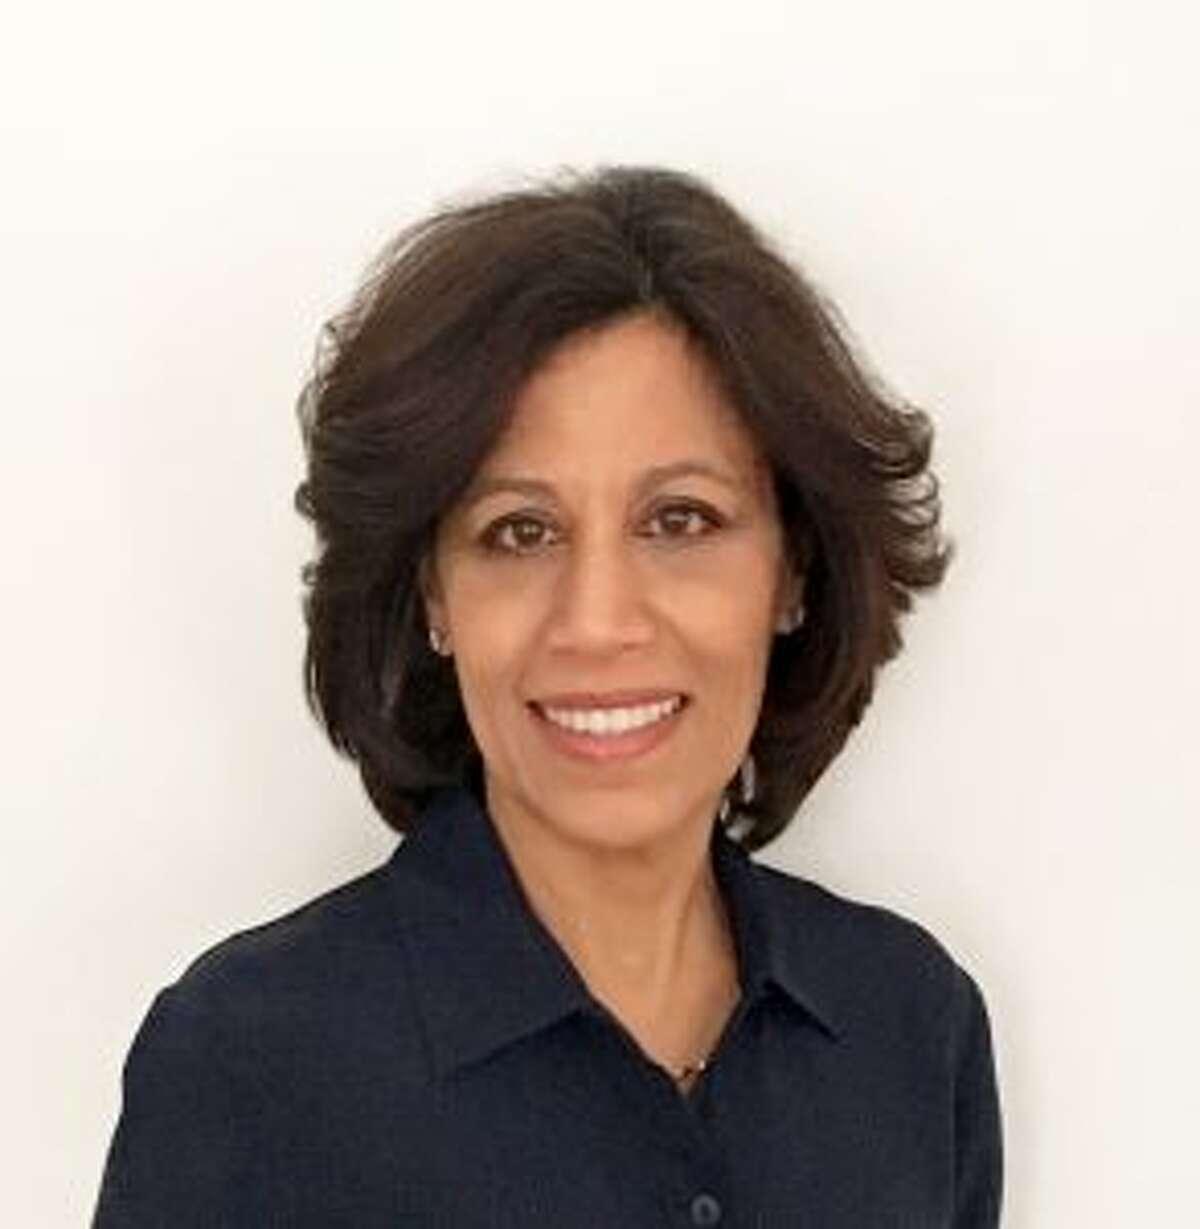 Indira D. Christie